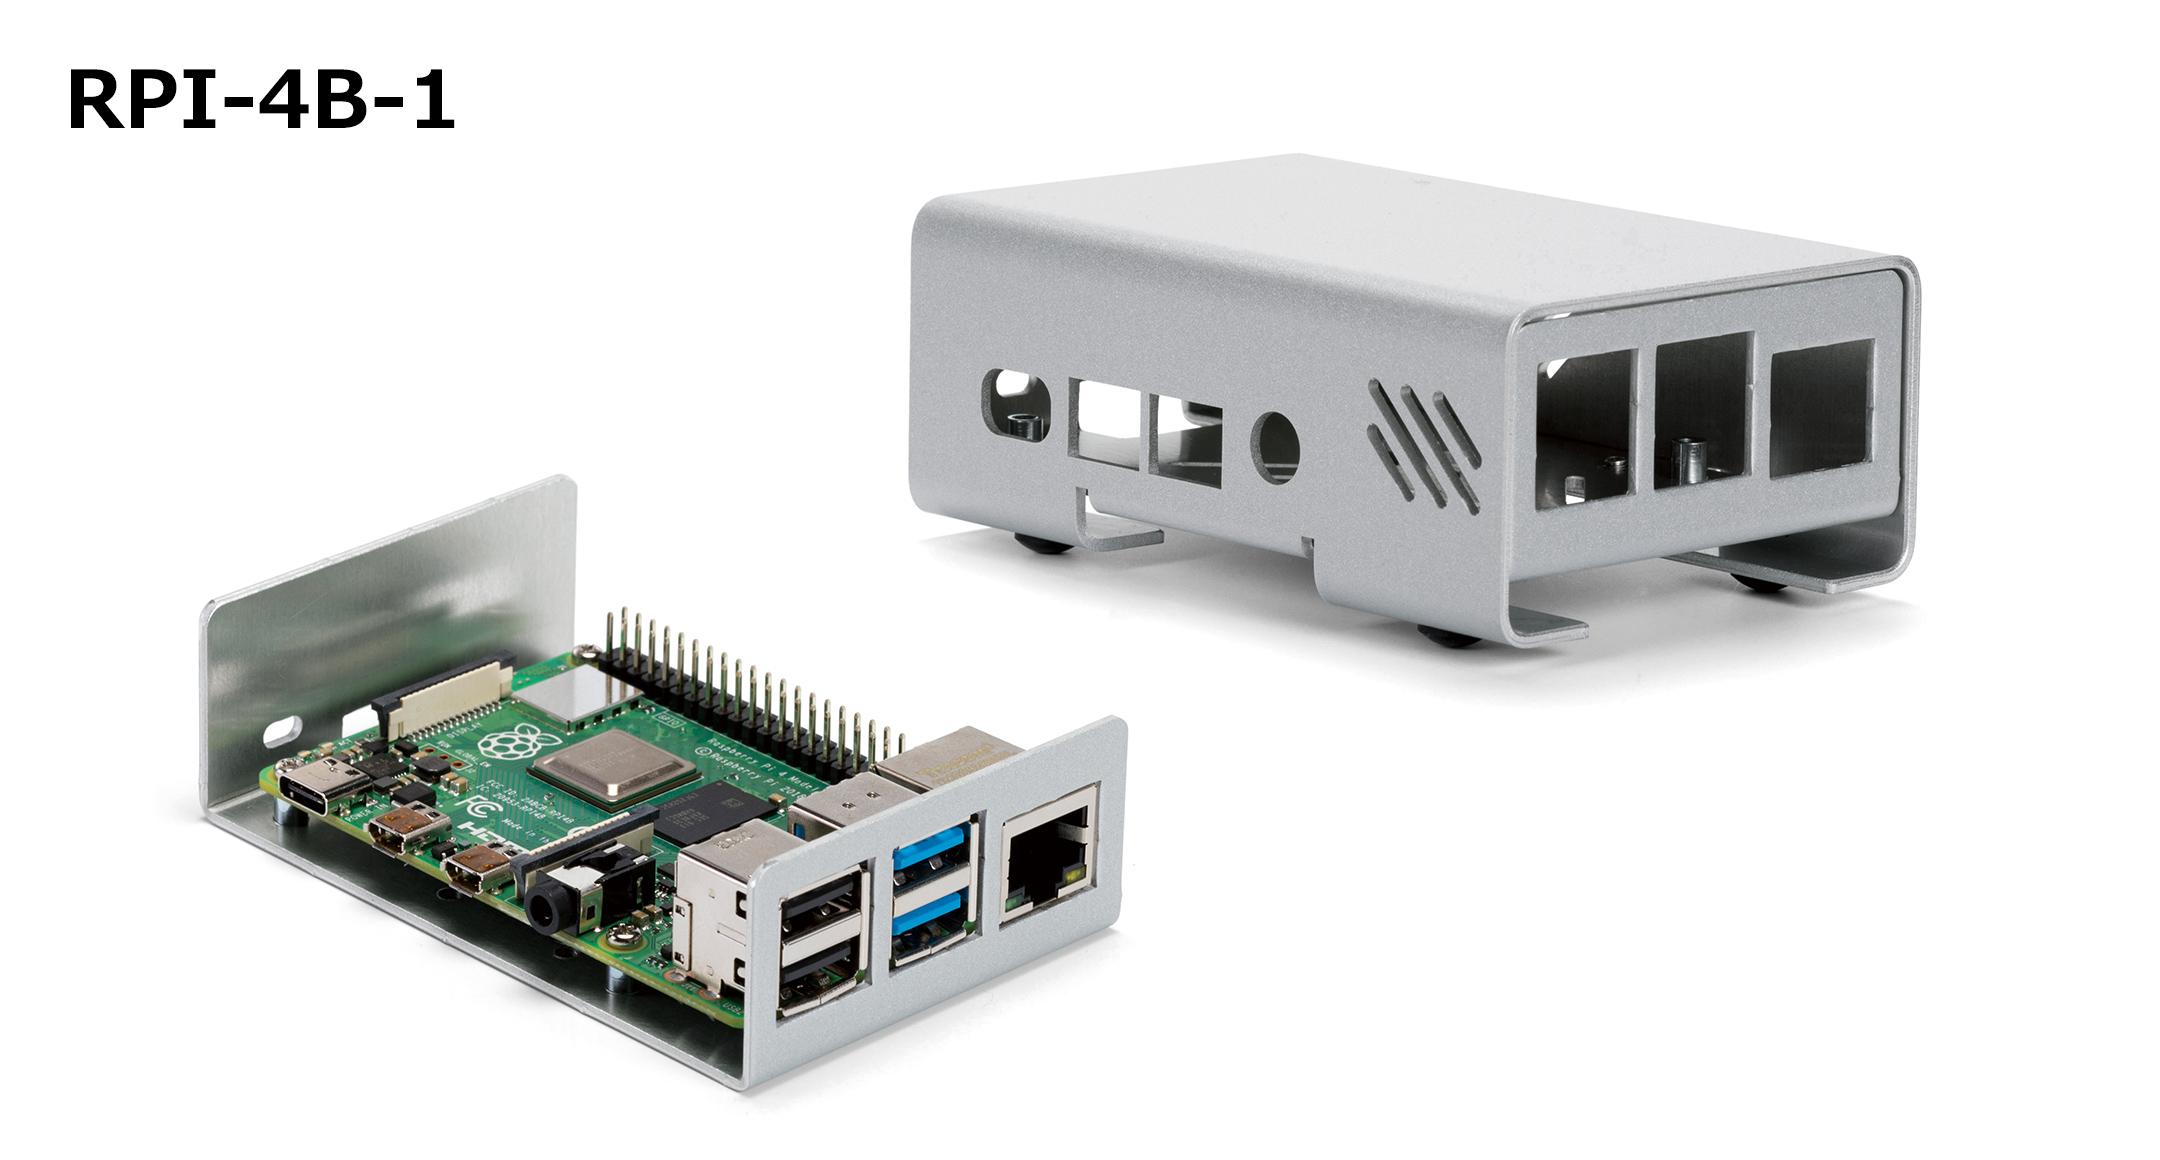 Raspberry Pi 4B ケース アルミ製 RPI-4シリーズの画像